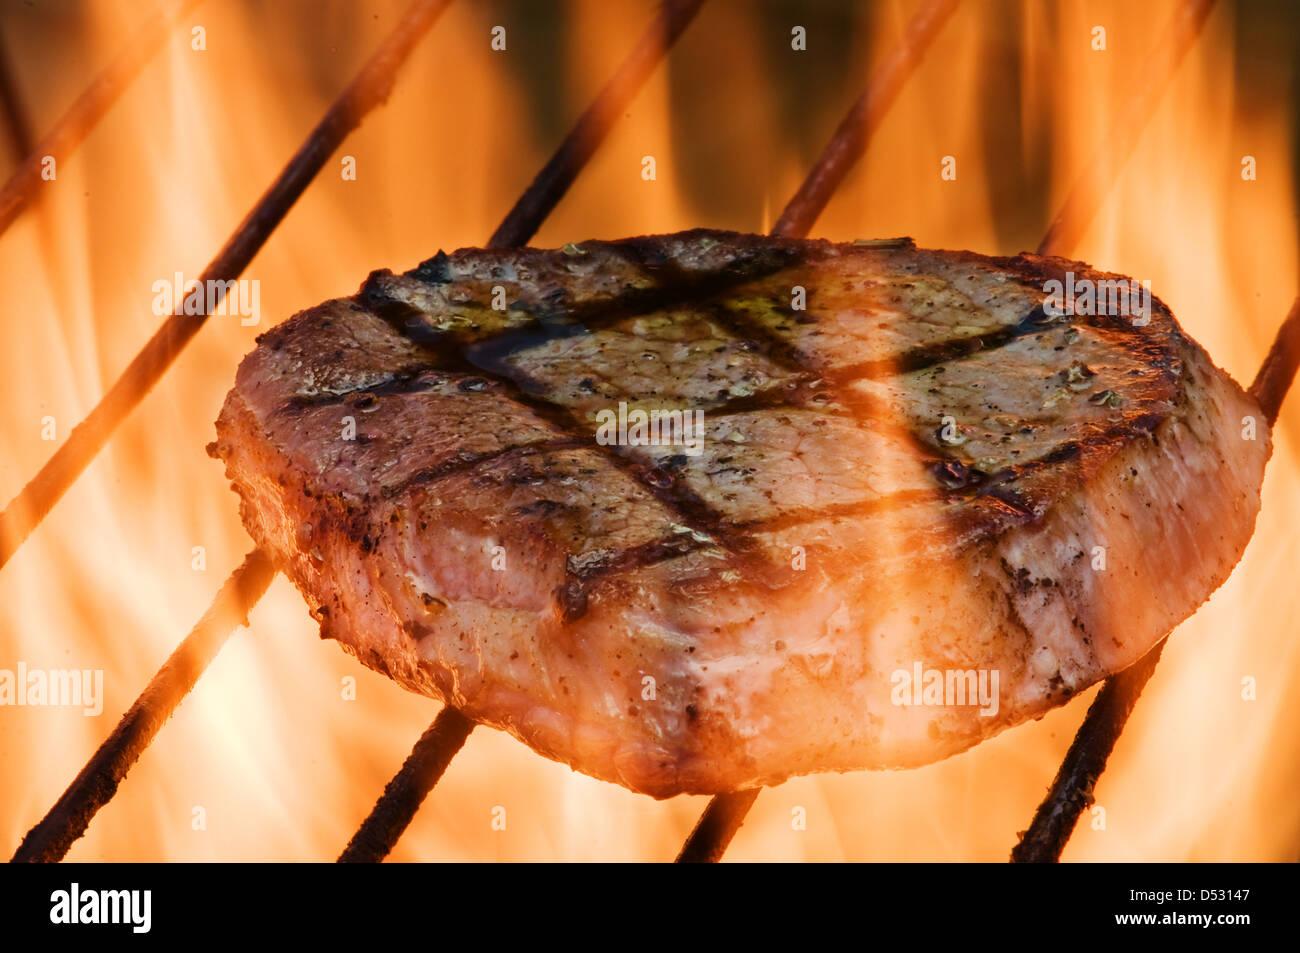 Le bifteck sur le grill bar rayé fiery closeup Photo Stock